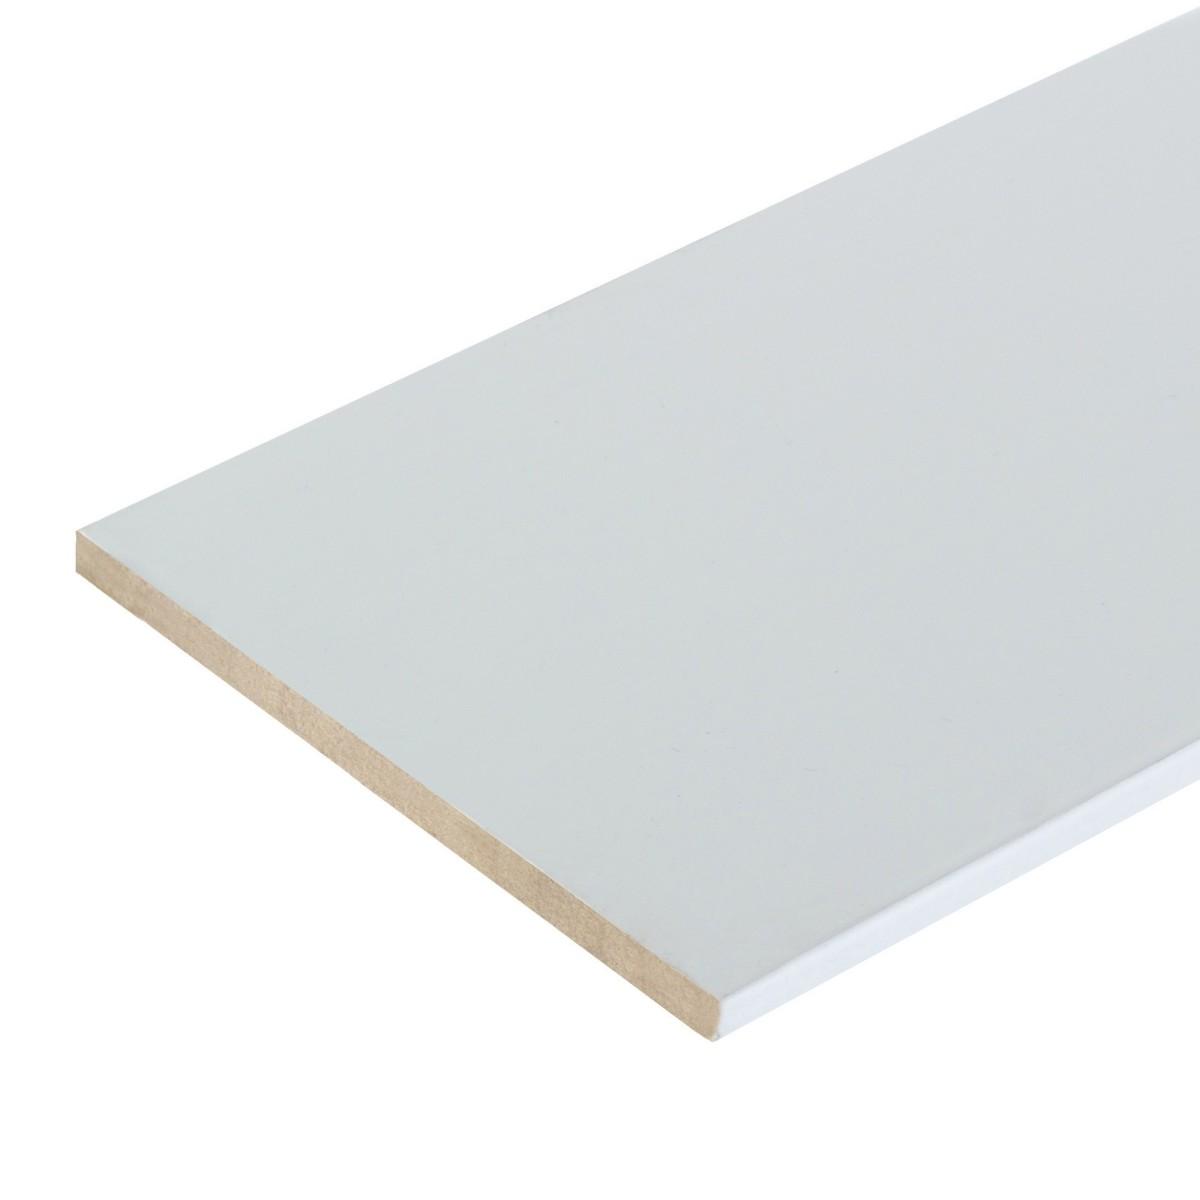 Добор 100 мм CPL цвет белый